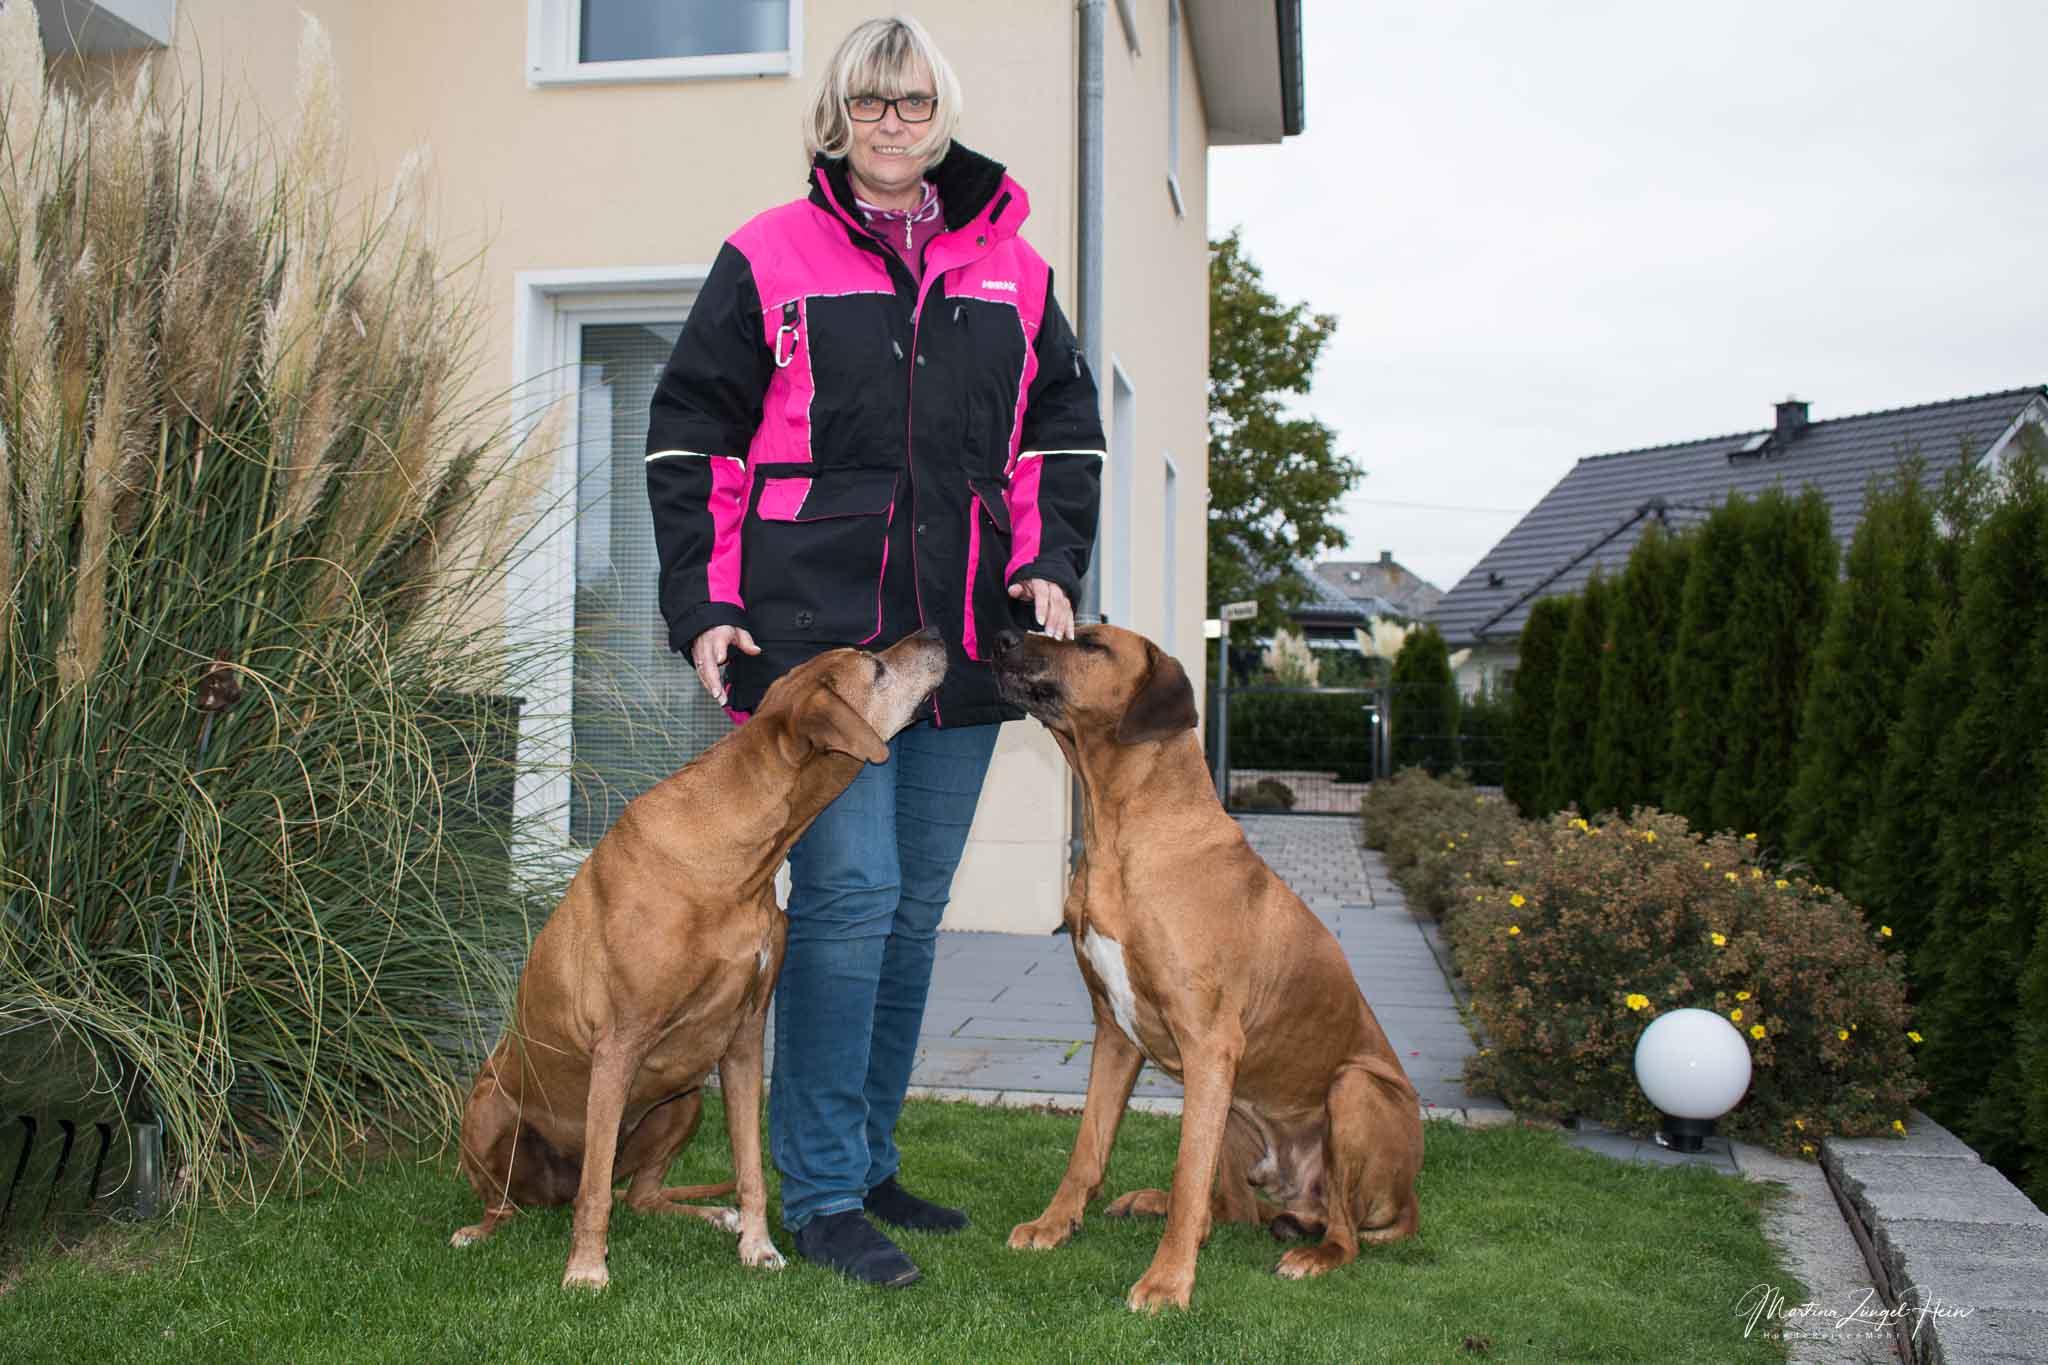 Arrak Outdoor Original Jacke - meine neue Hundejacke